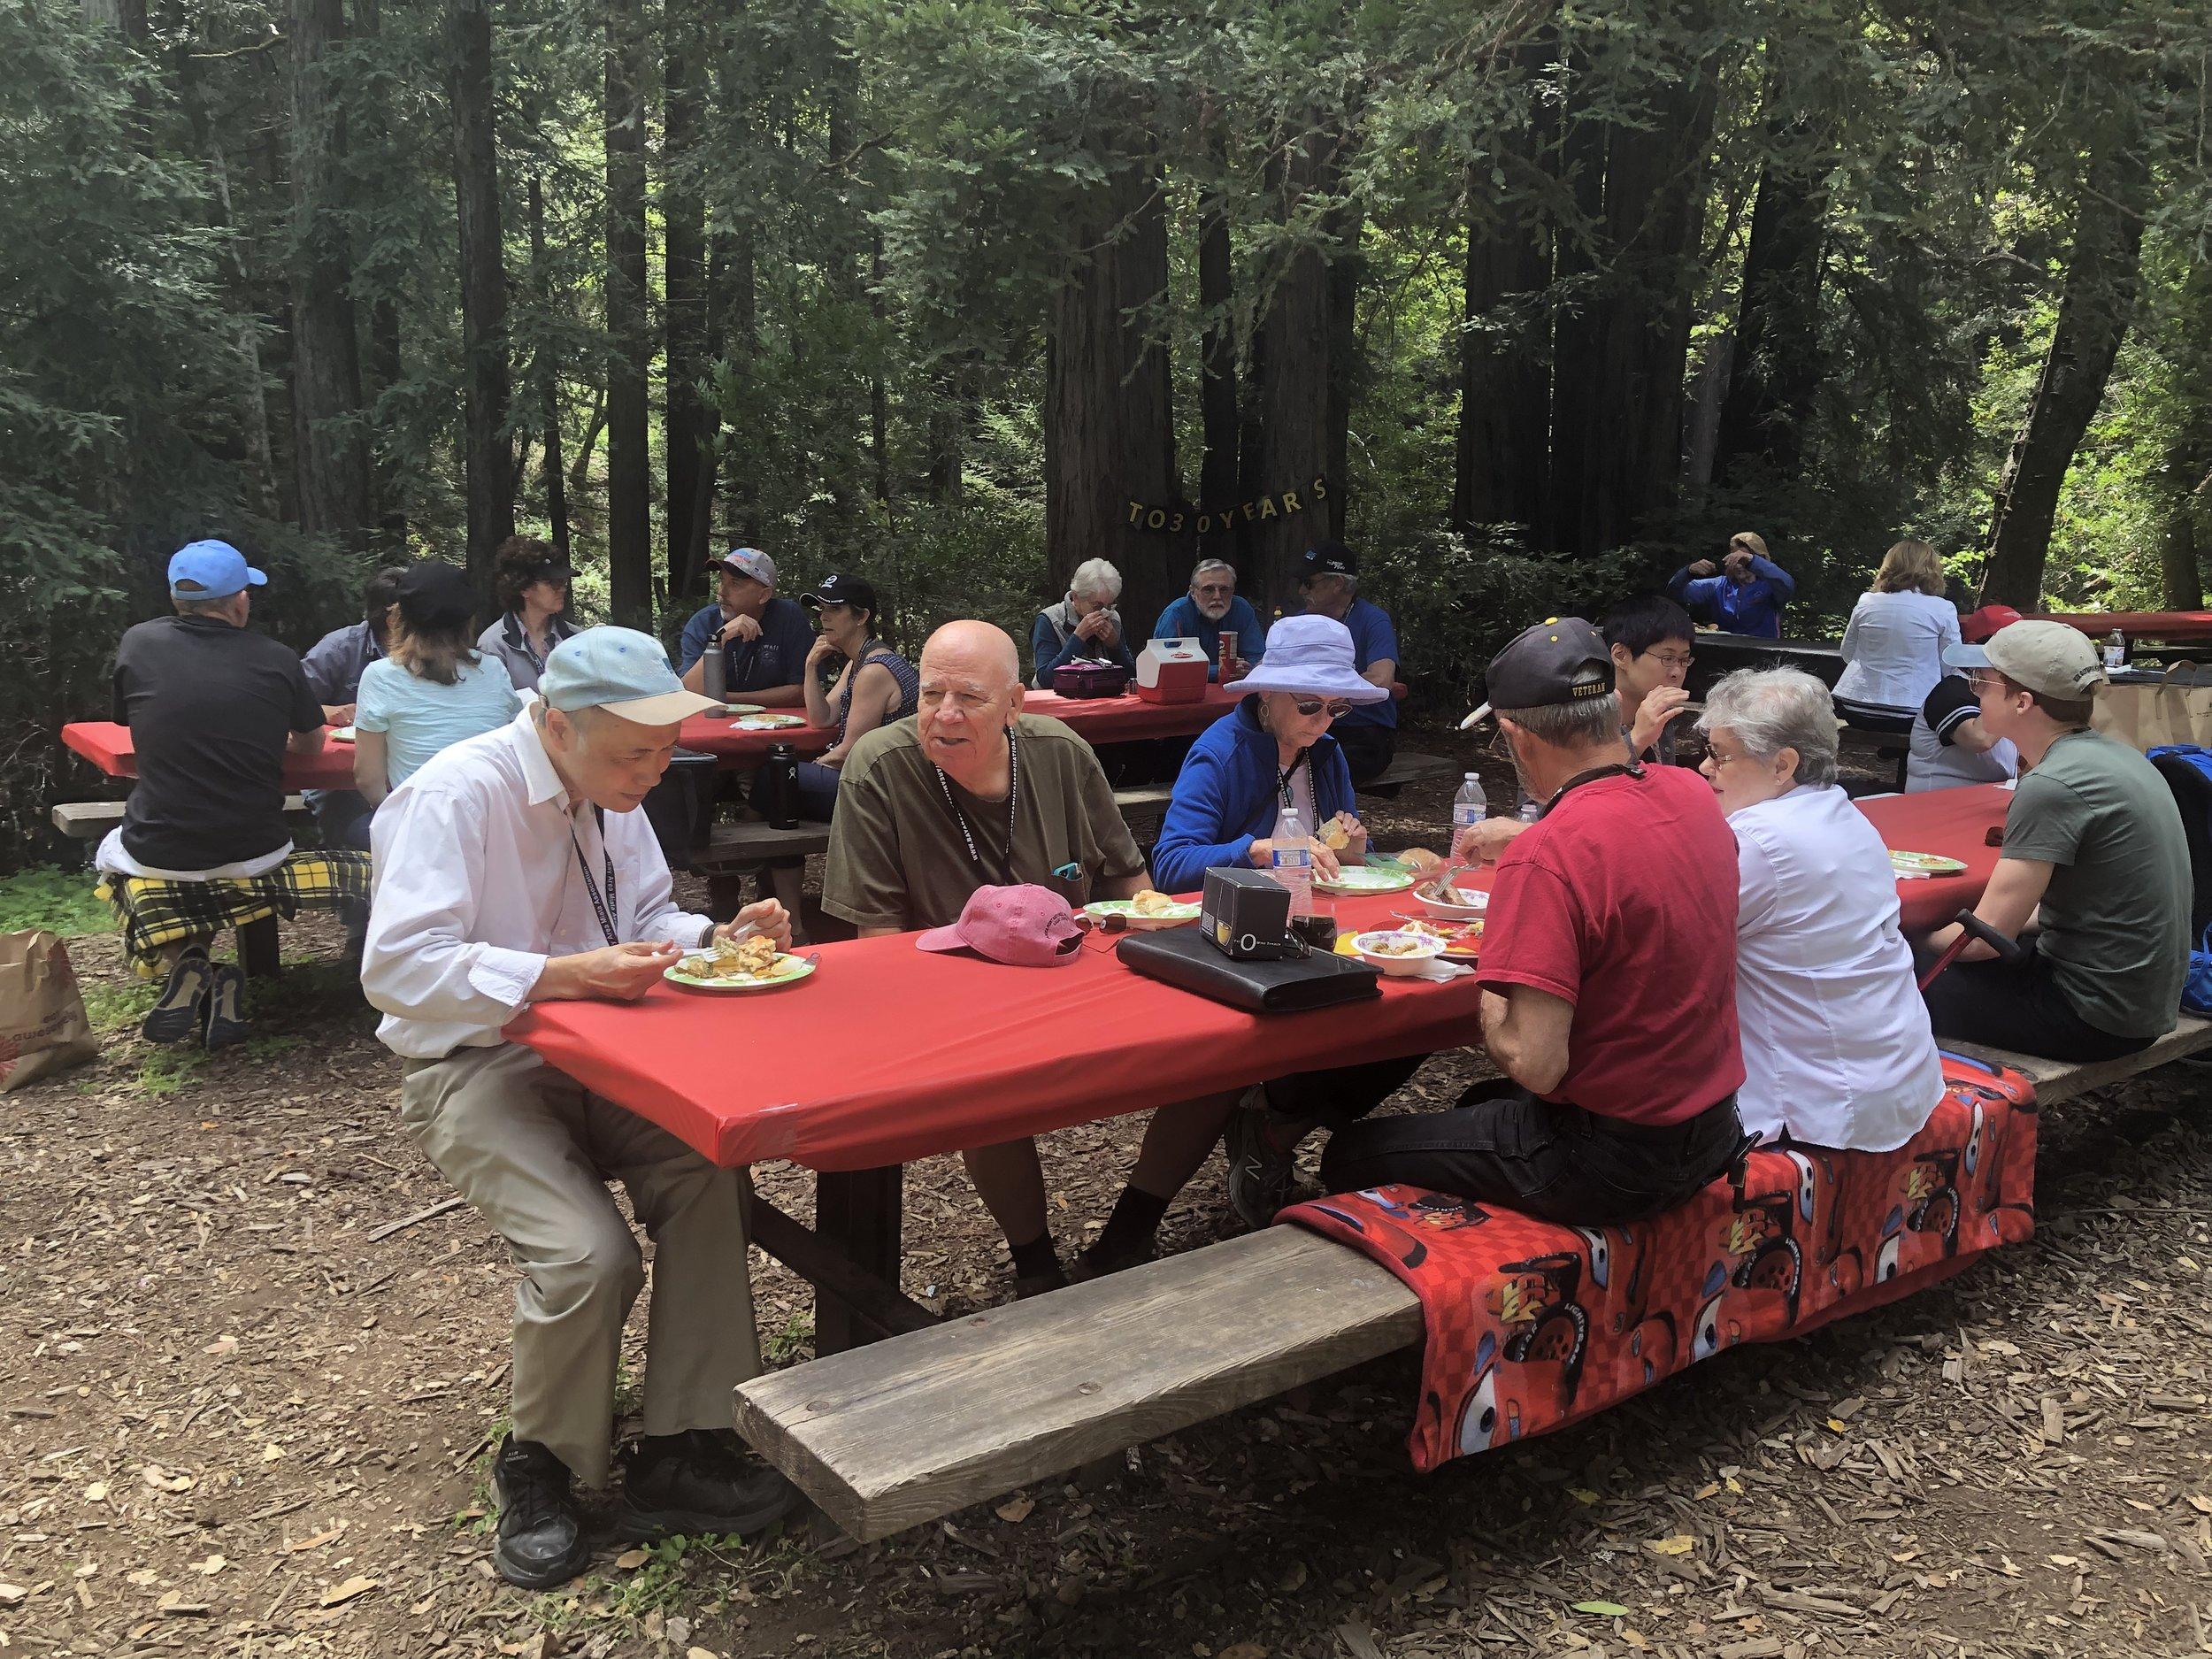 Bama picnic - 1 (4).jpg